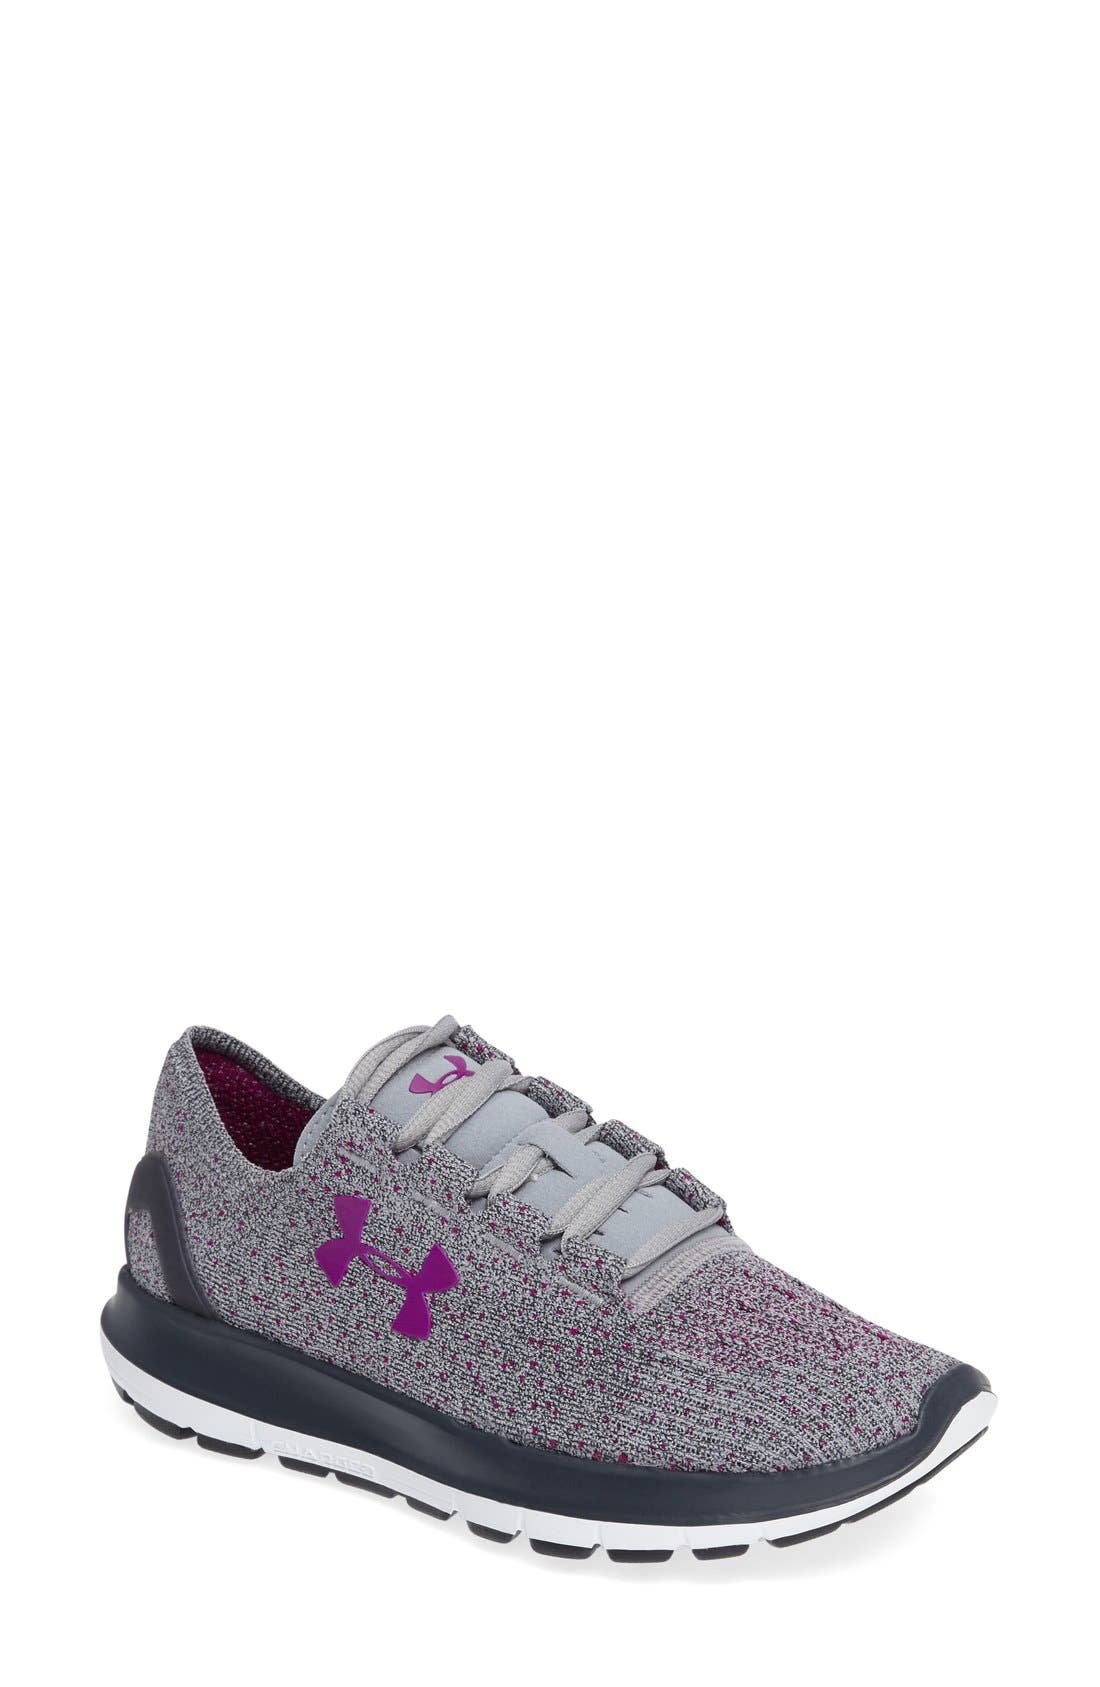 Alternate Image 1 Selected - Under Armour SpeedForm® Slingride Tri Running Shoe (Women)